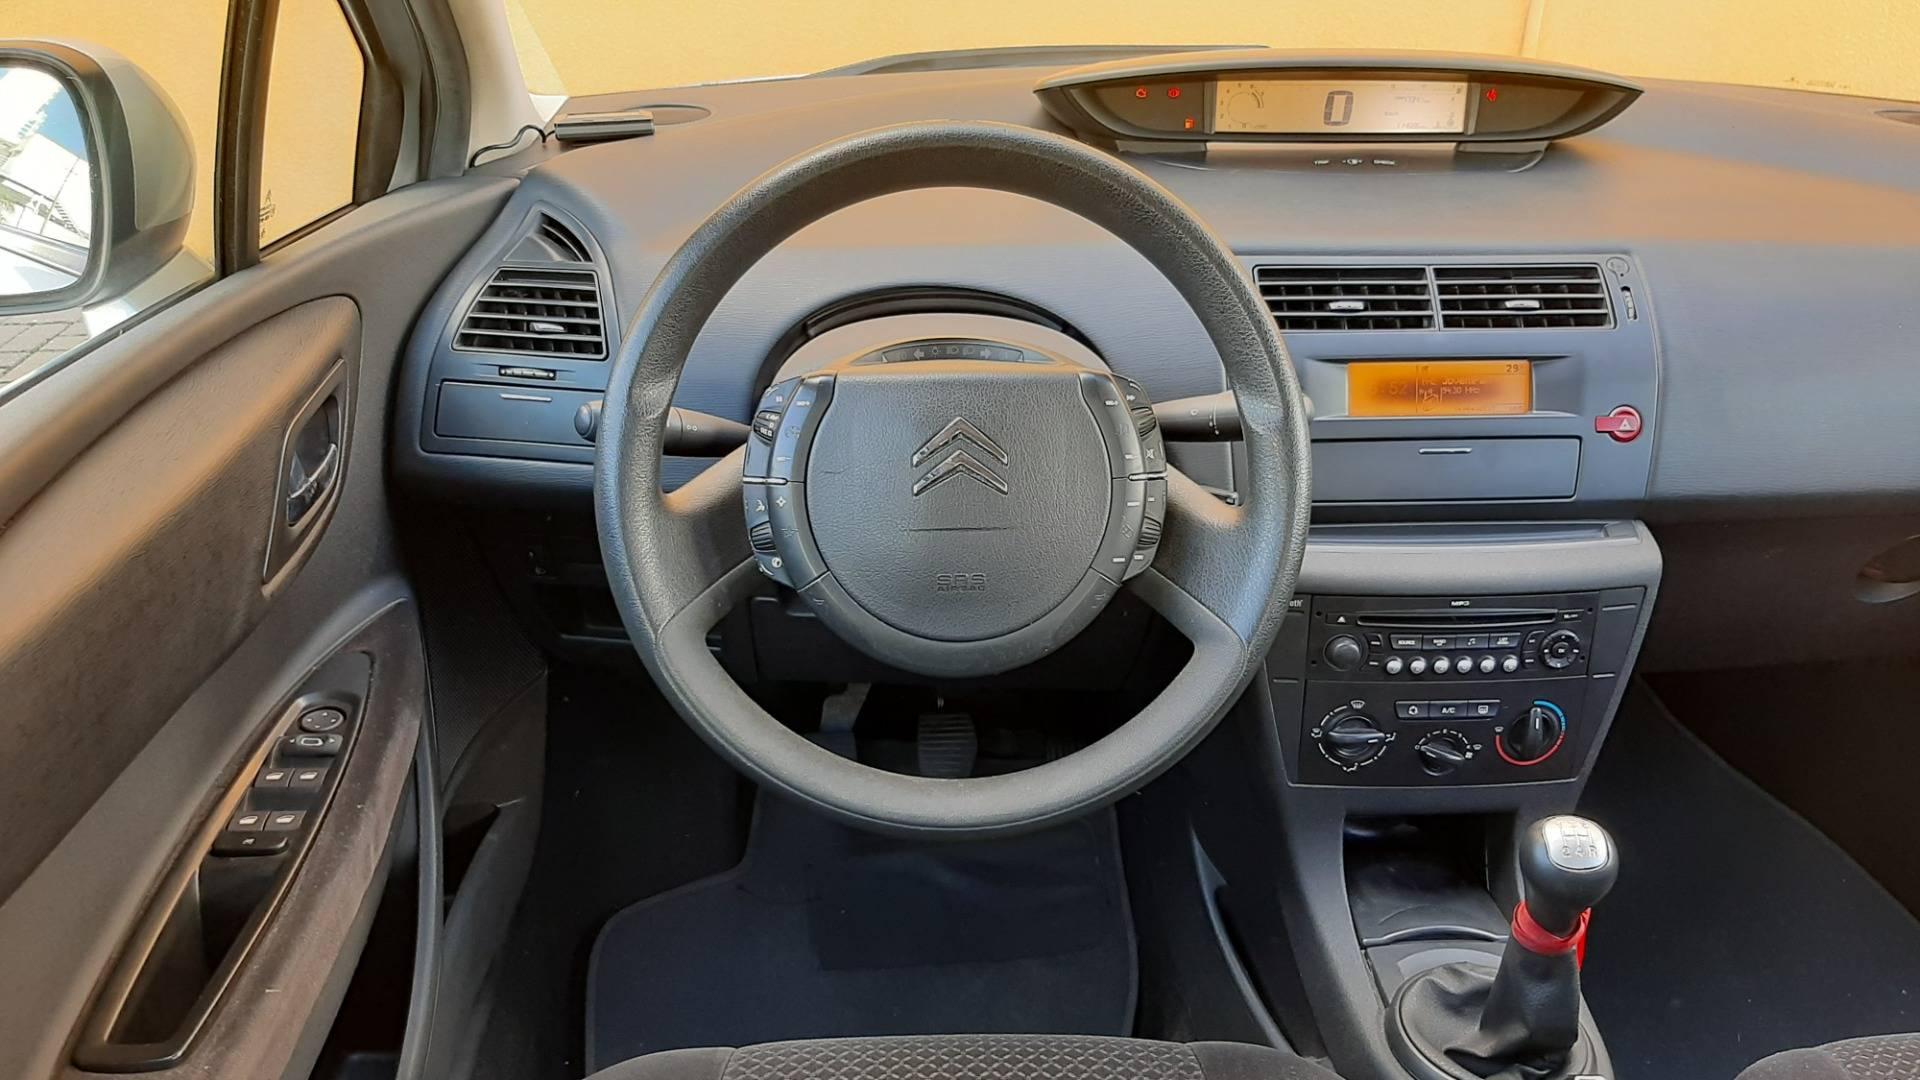 CITROEN C4 Sedan 2.0 16V 4P GLX PALLAS FLEX, Foto 8